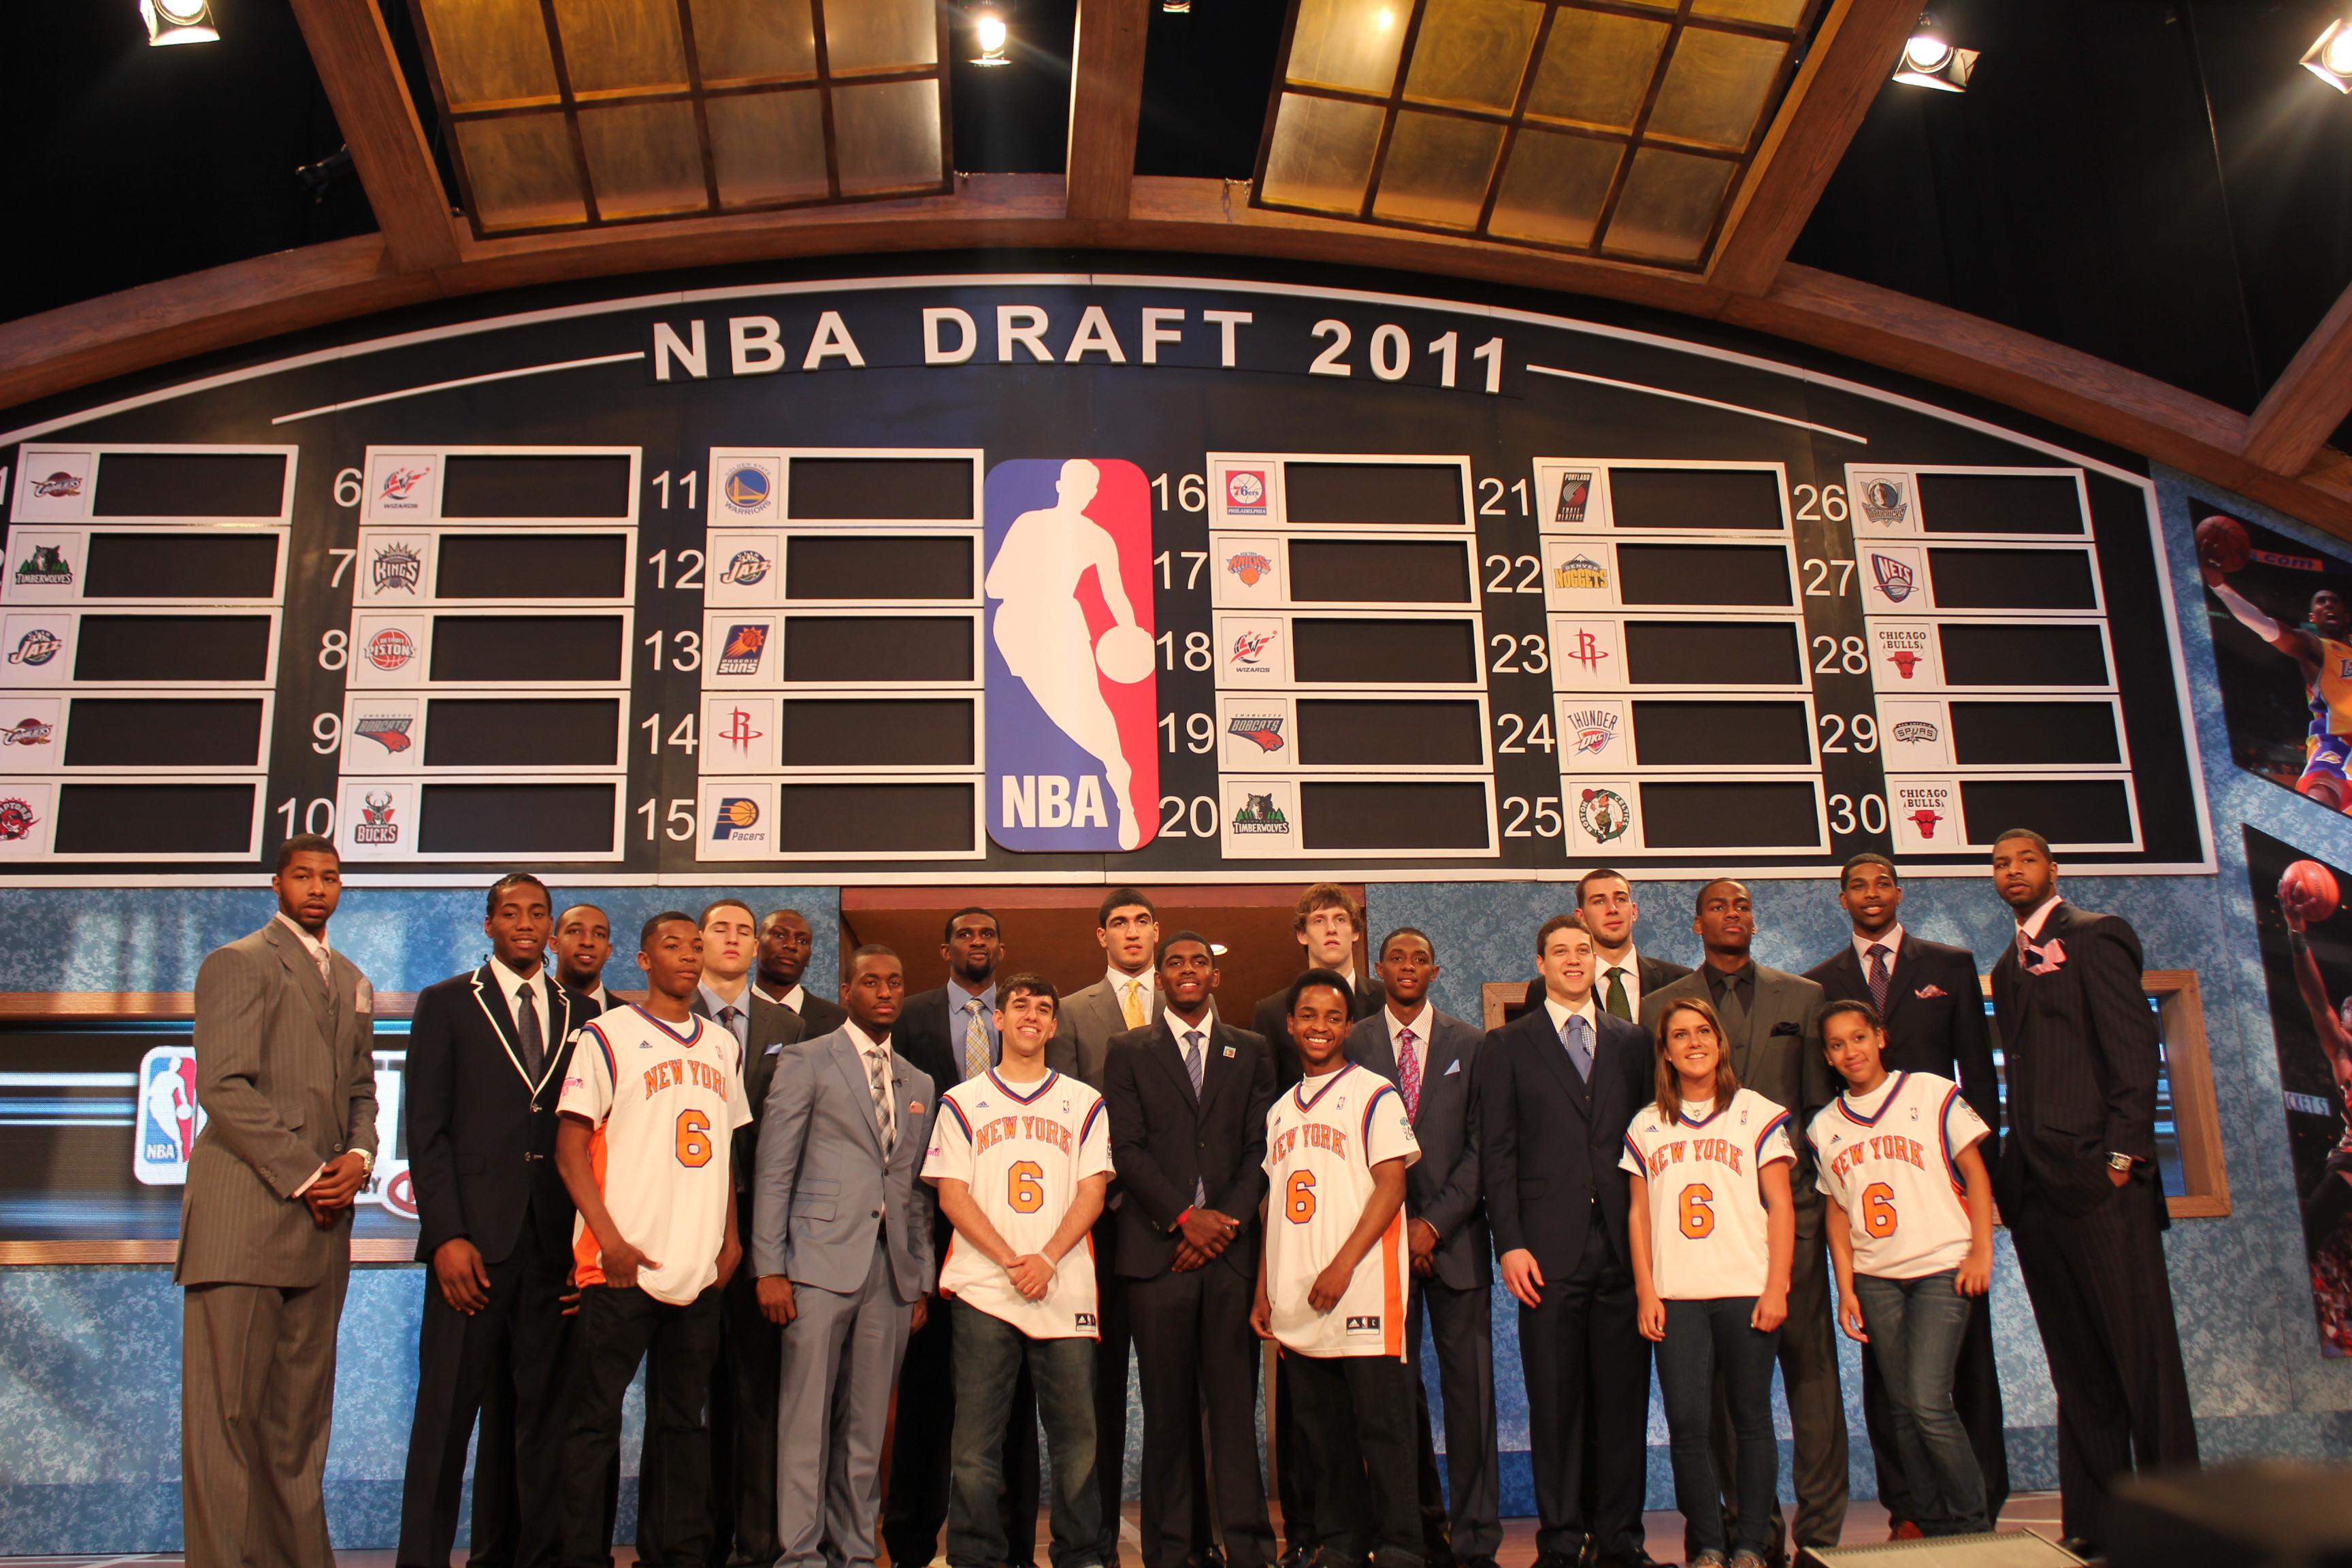 Nba Draft: NBA Draft Experience